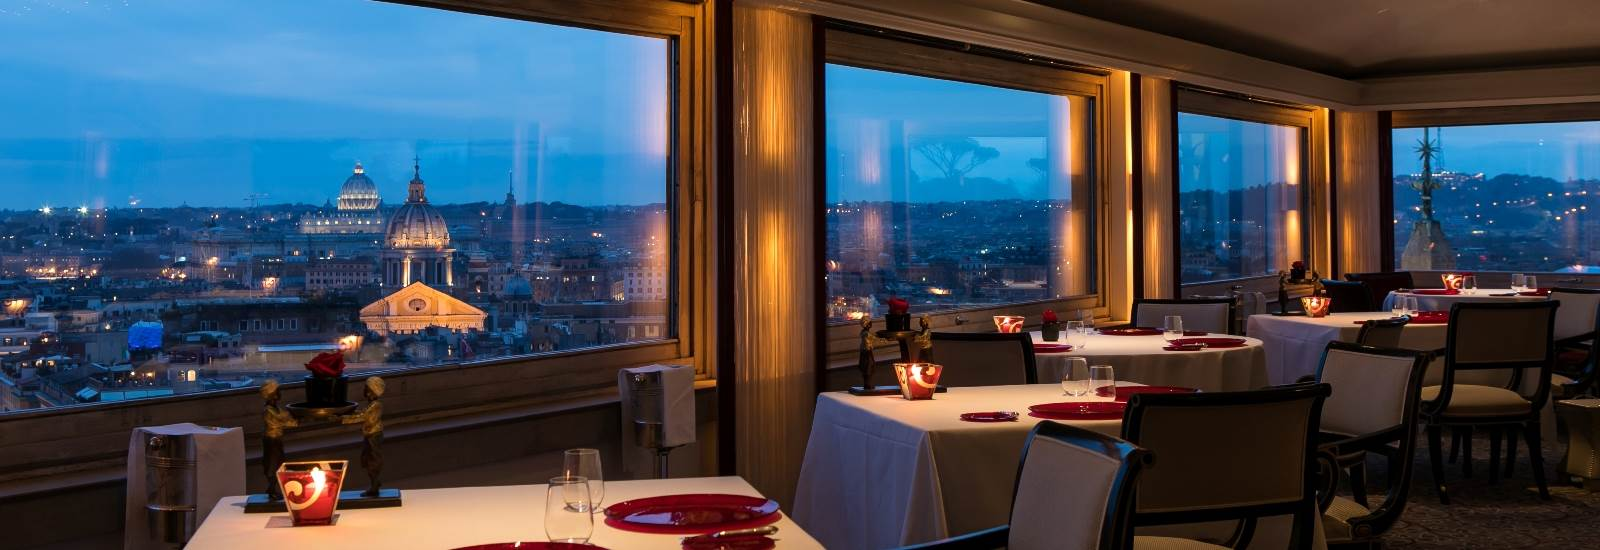 Michelin Star Restaurants In Rome Imago